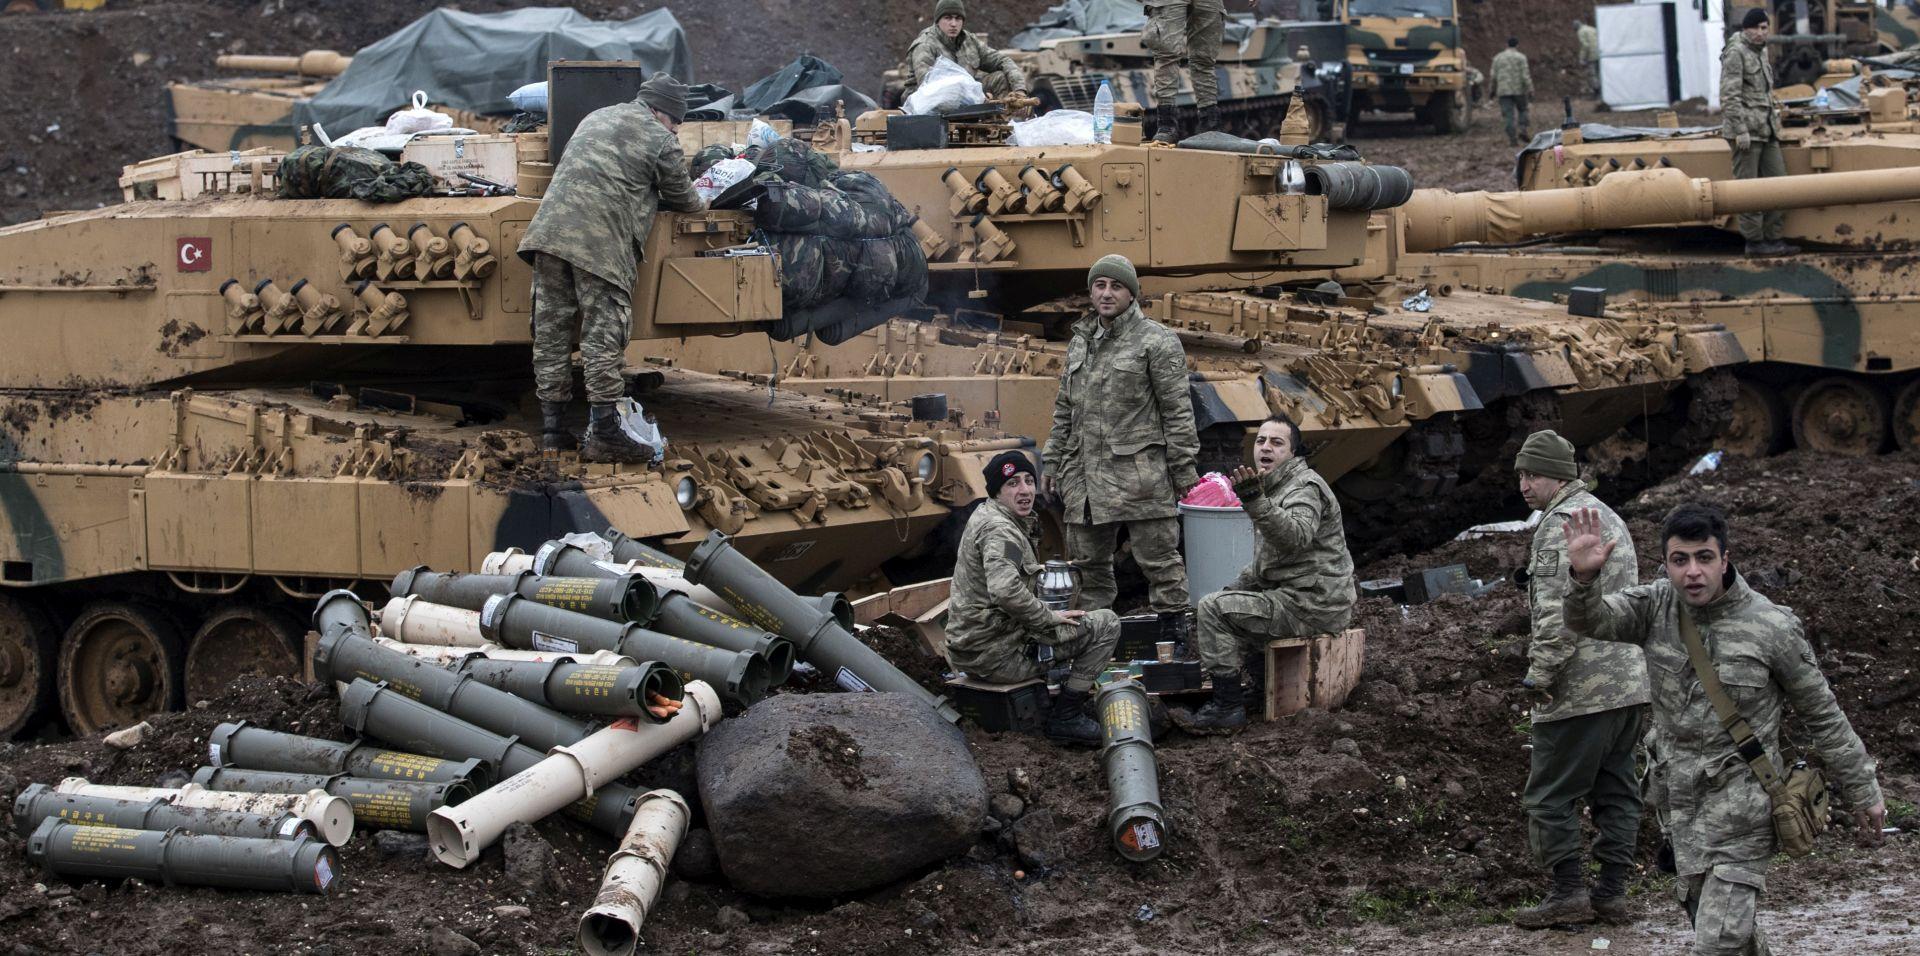 Sedam turskih vojnika poginulo danas u Siriji